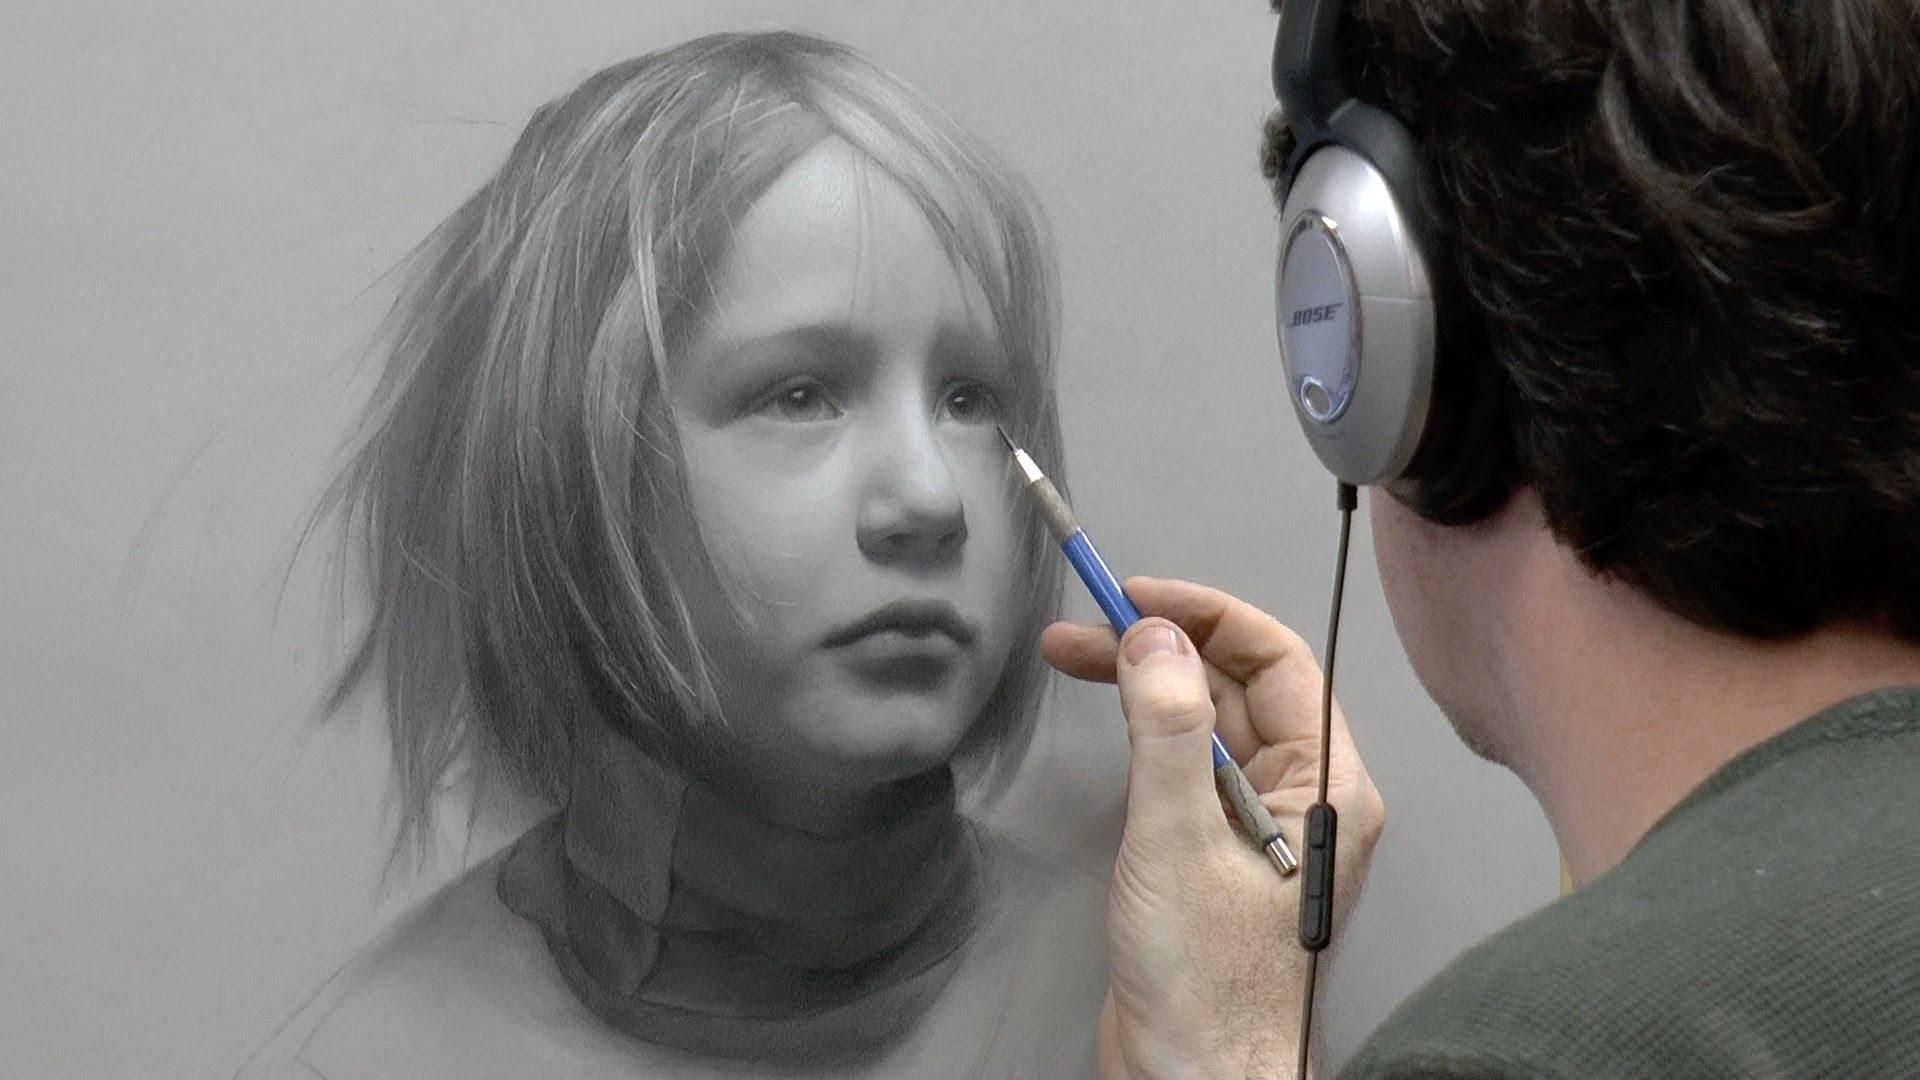 Drawn portrait kid Of of – Static